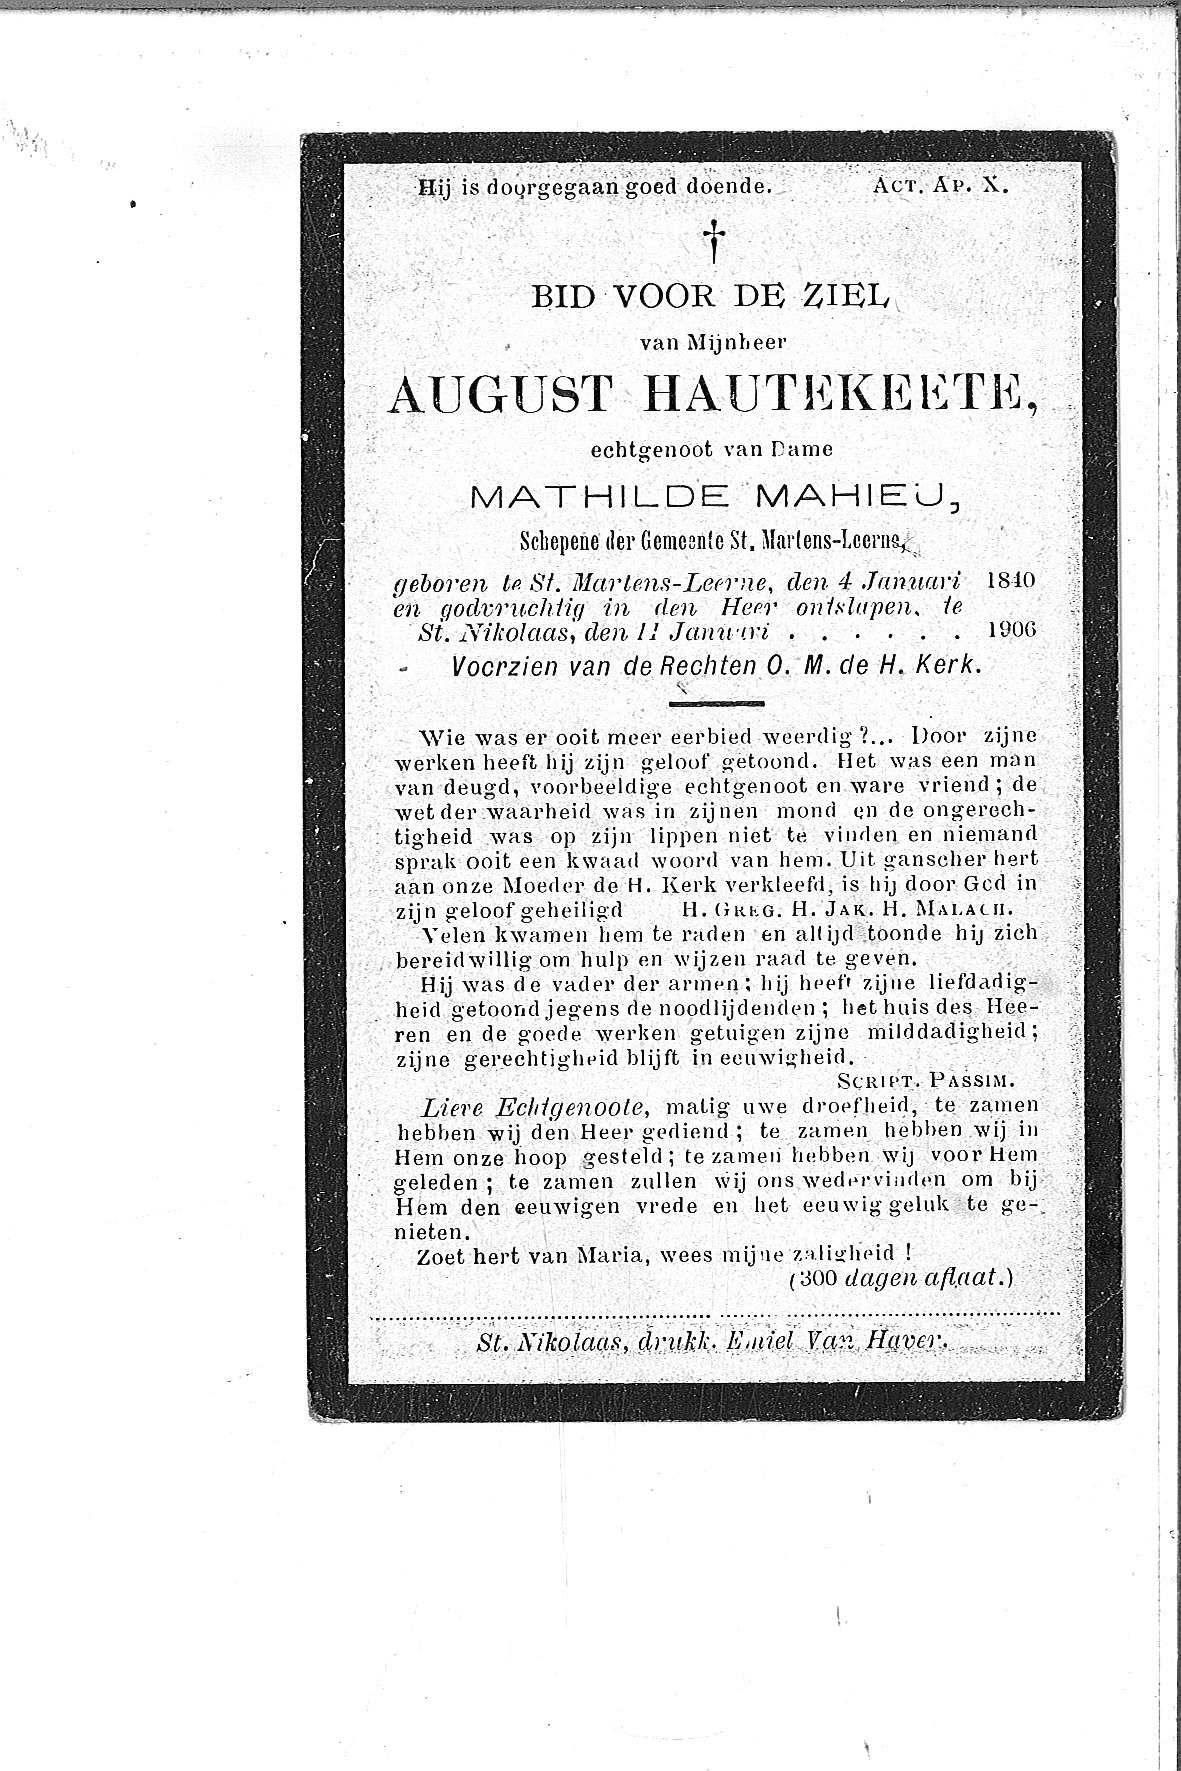 August(1906)20140820143544_00004.jpg